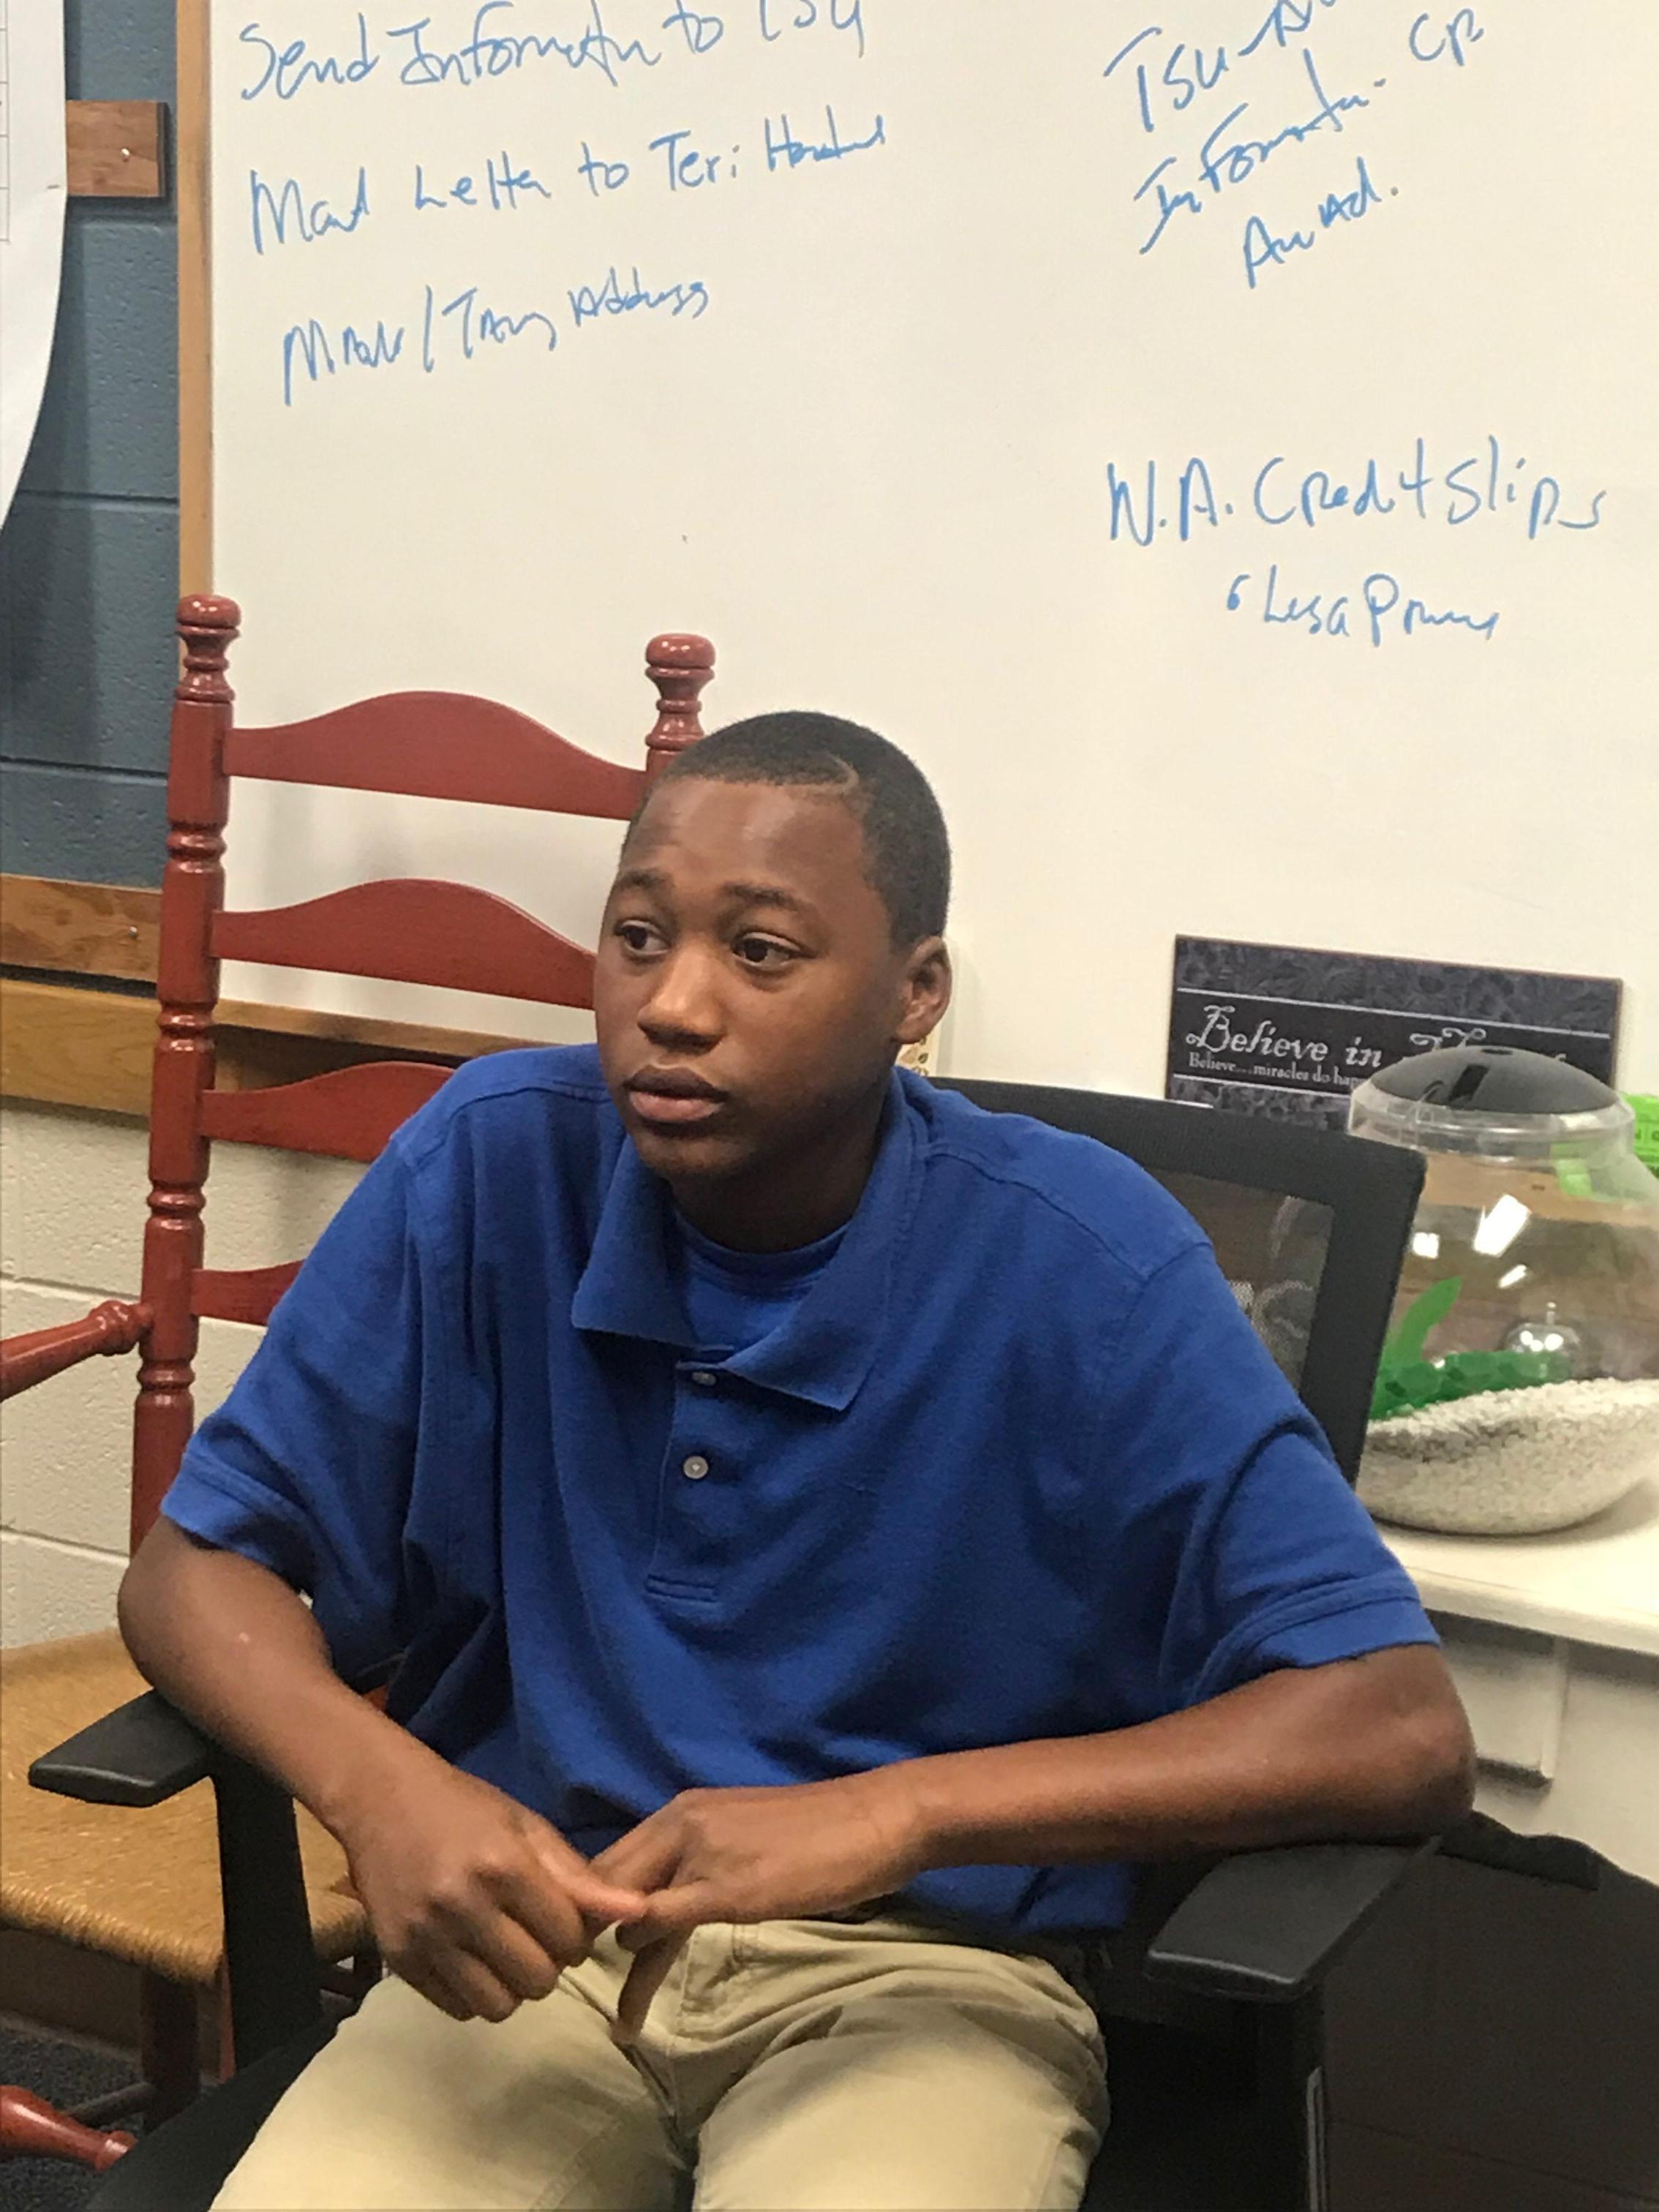 Sept 11 Essay Contest student winner